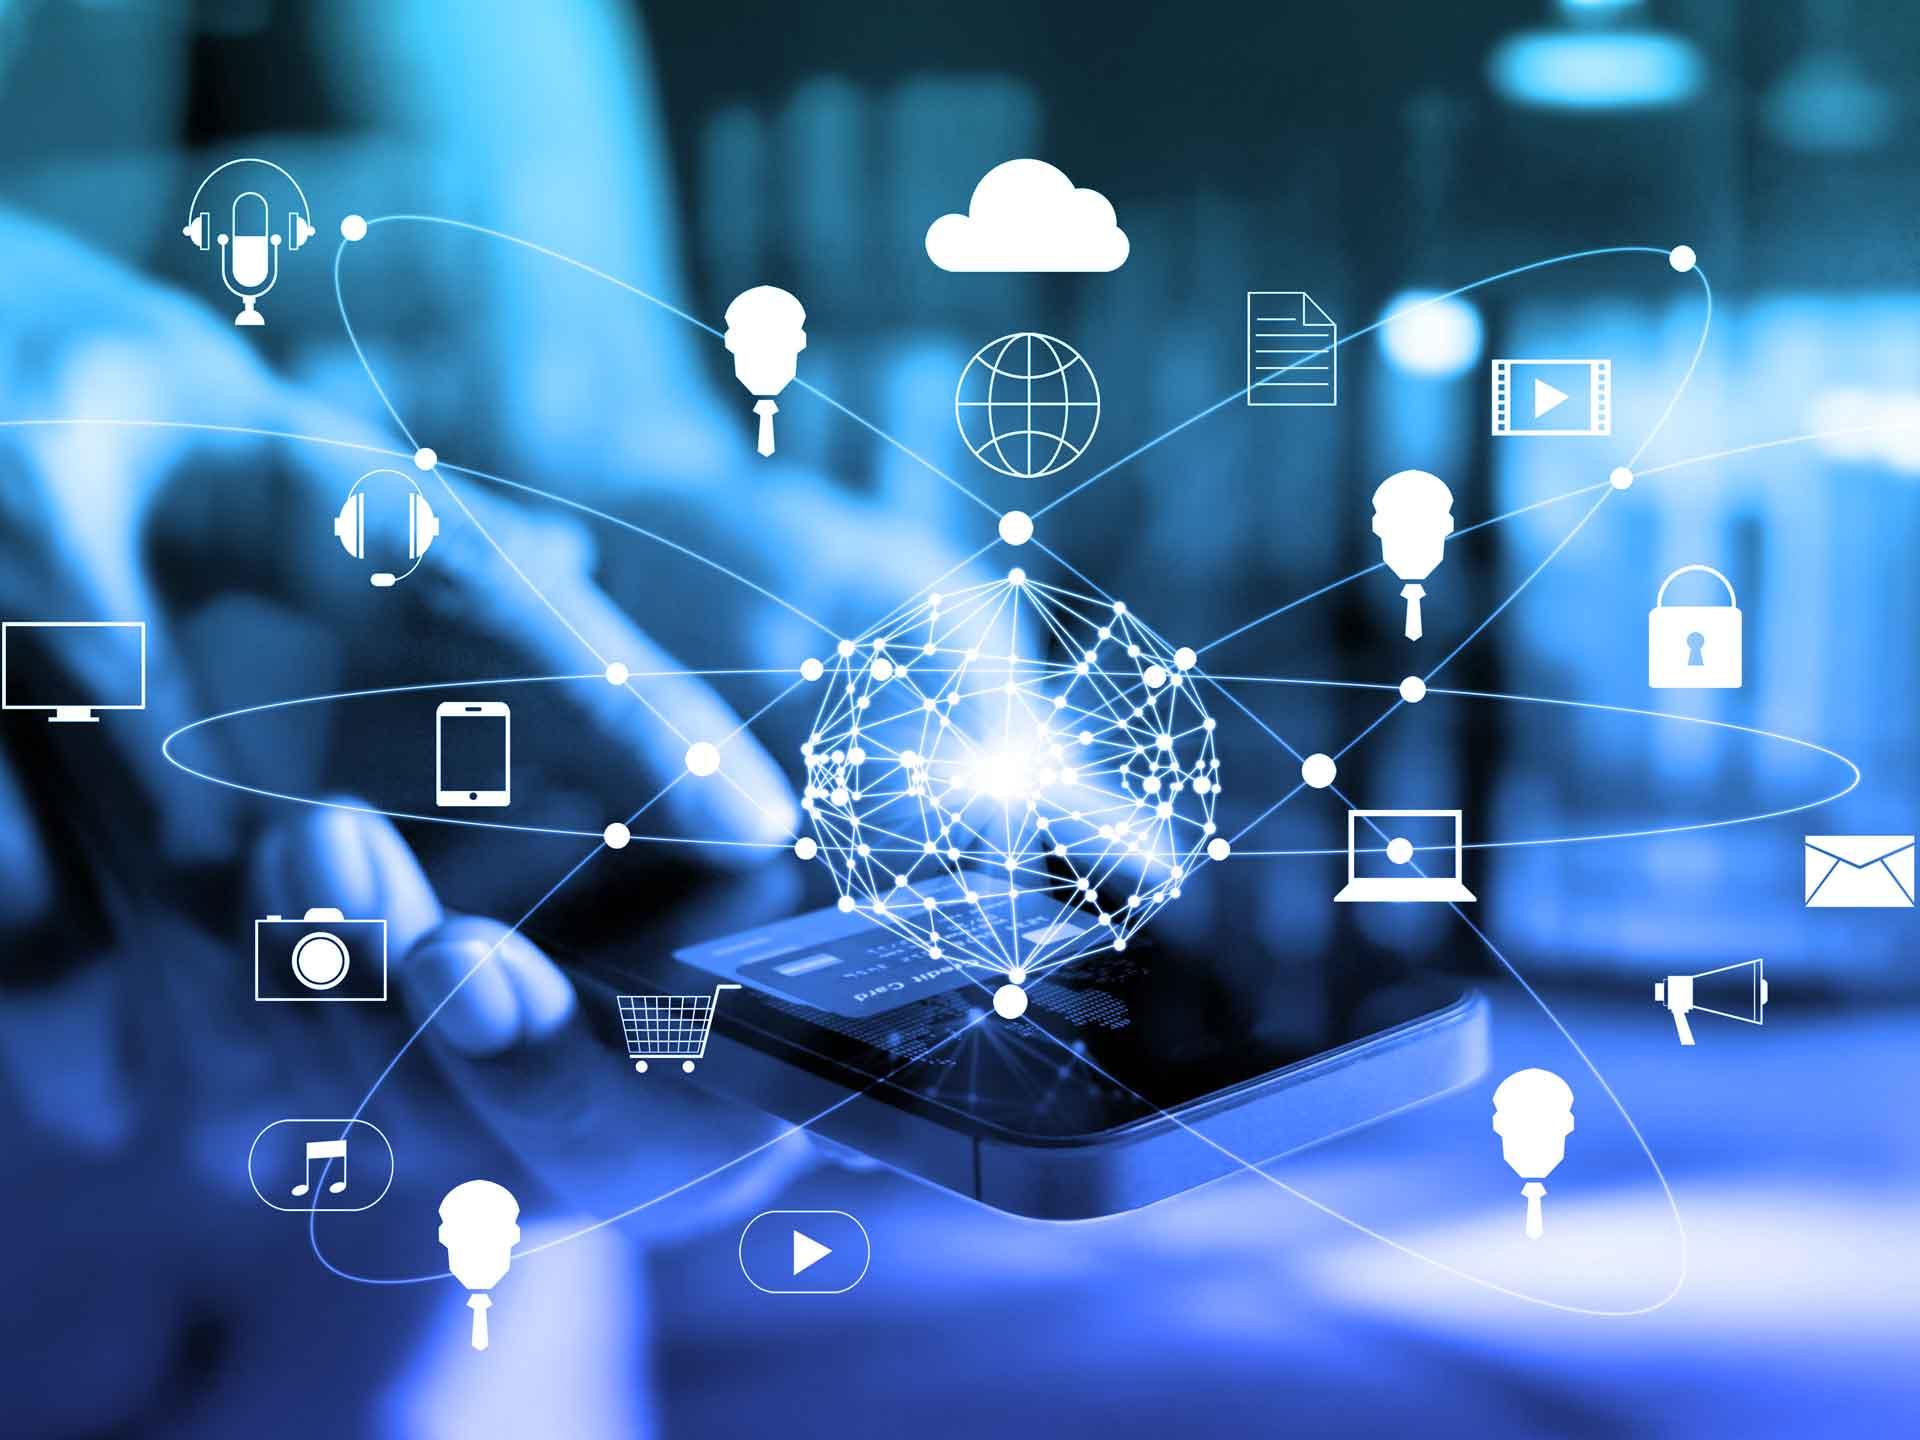 Microsoft Dynamics 365 Customer Service | Omnichannel Service